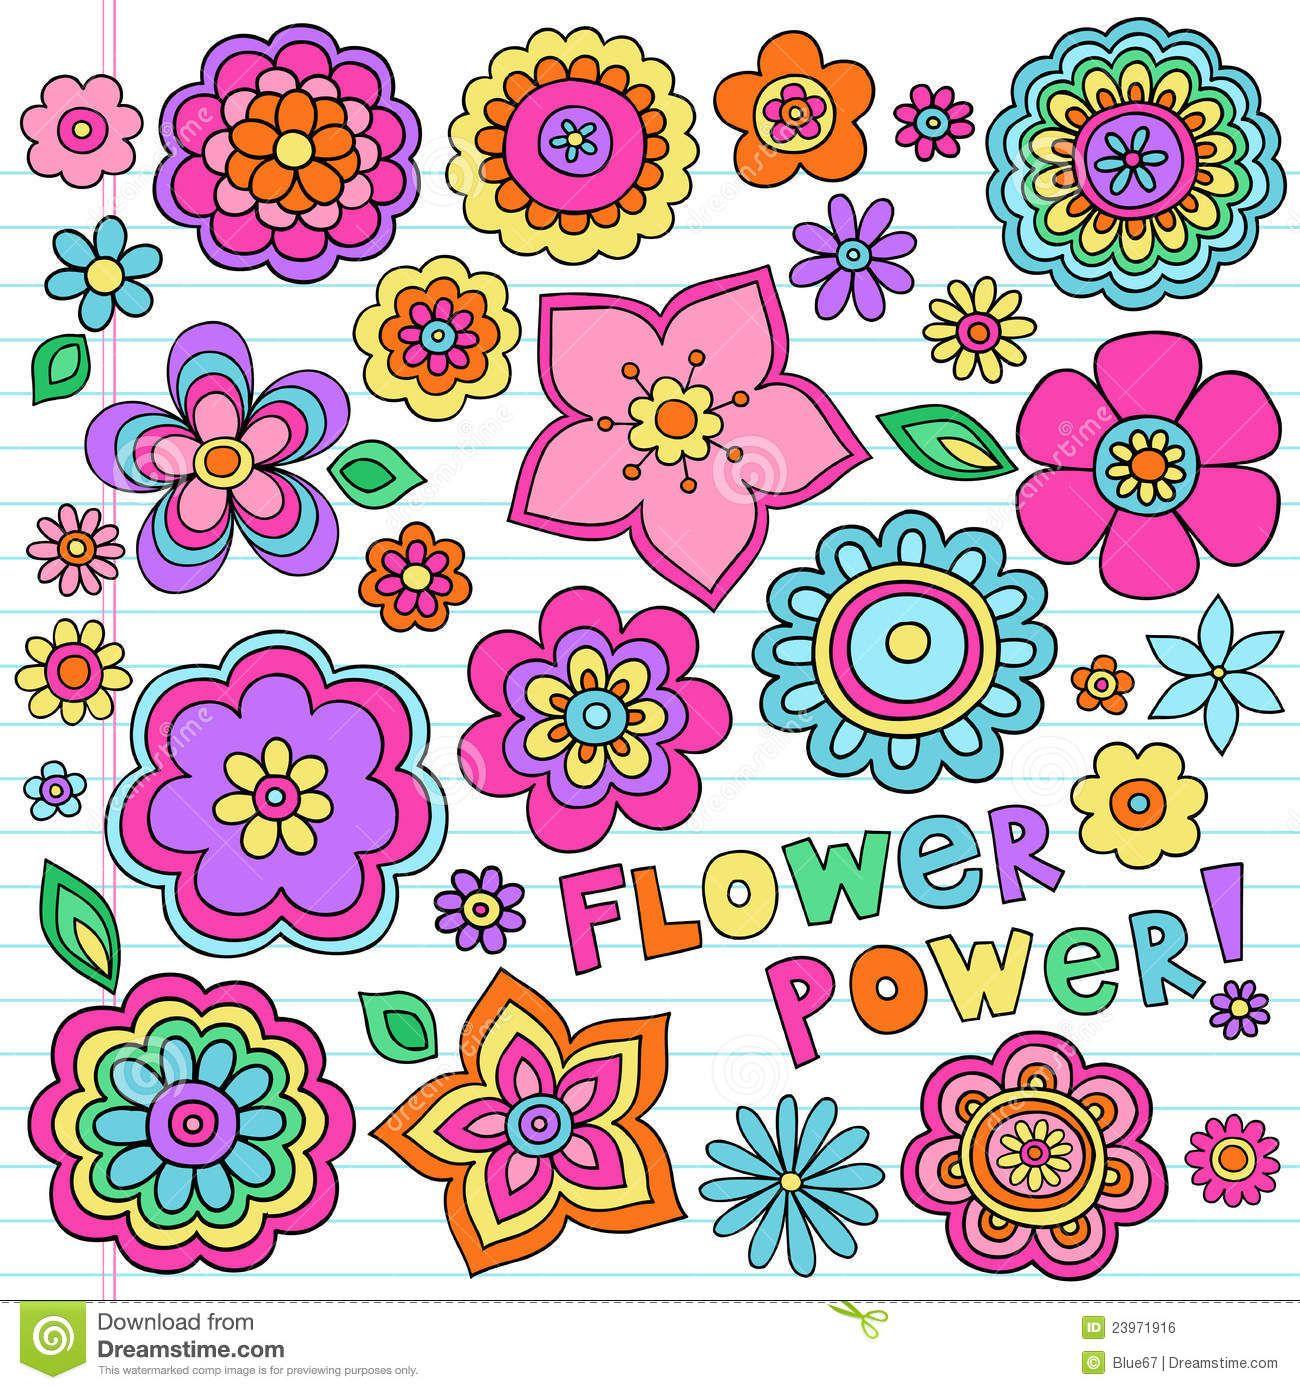 Love flower power daisy graffiti print cotton fabric 60s 70s retro - La Potencia De Flor Psicodlica Doodles El Conjunto